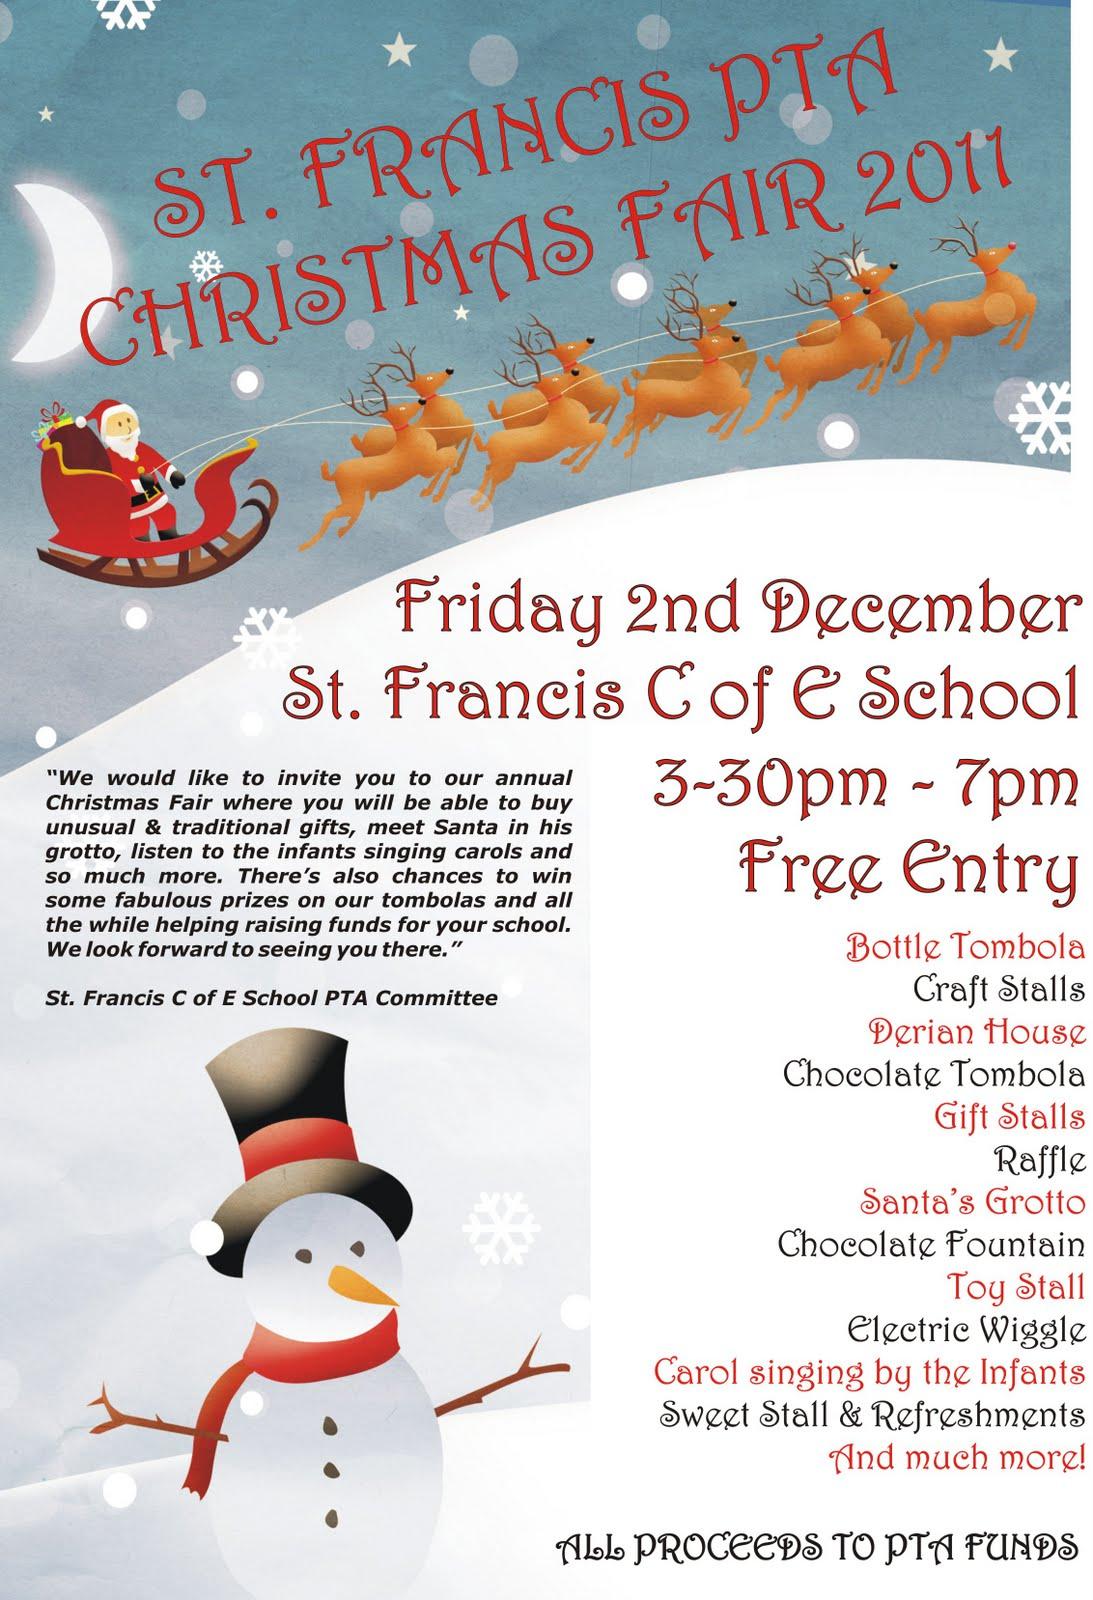 School christmas fair posters / Imdb party down south